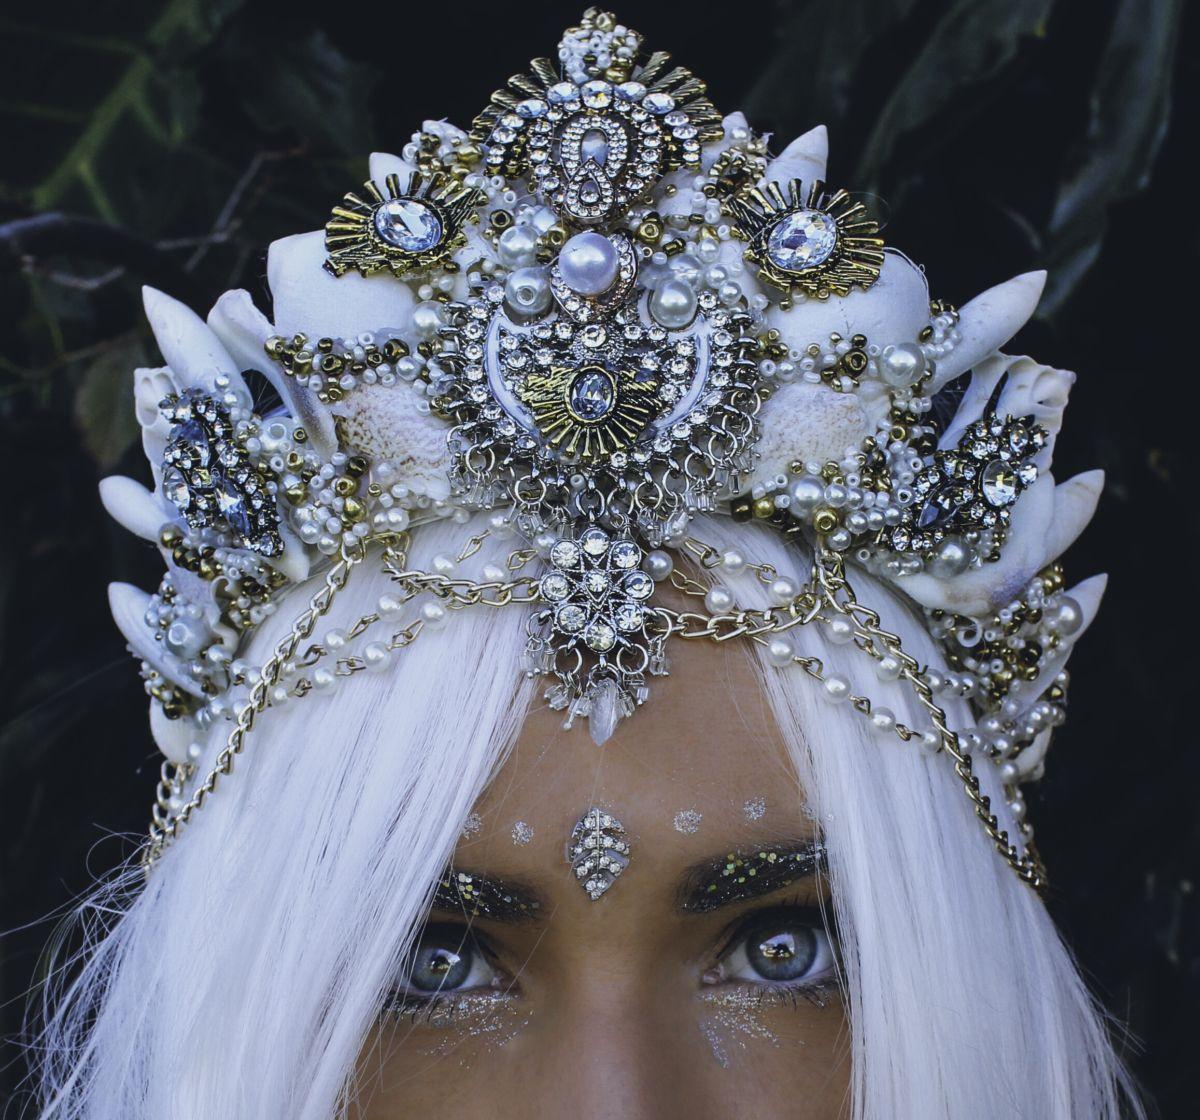 Stunning Handmade Mermaid Seashell Crowns by Chelsea Shiels #mermaid